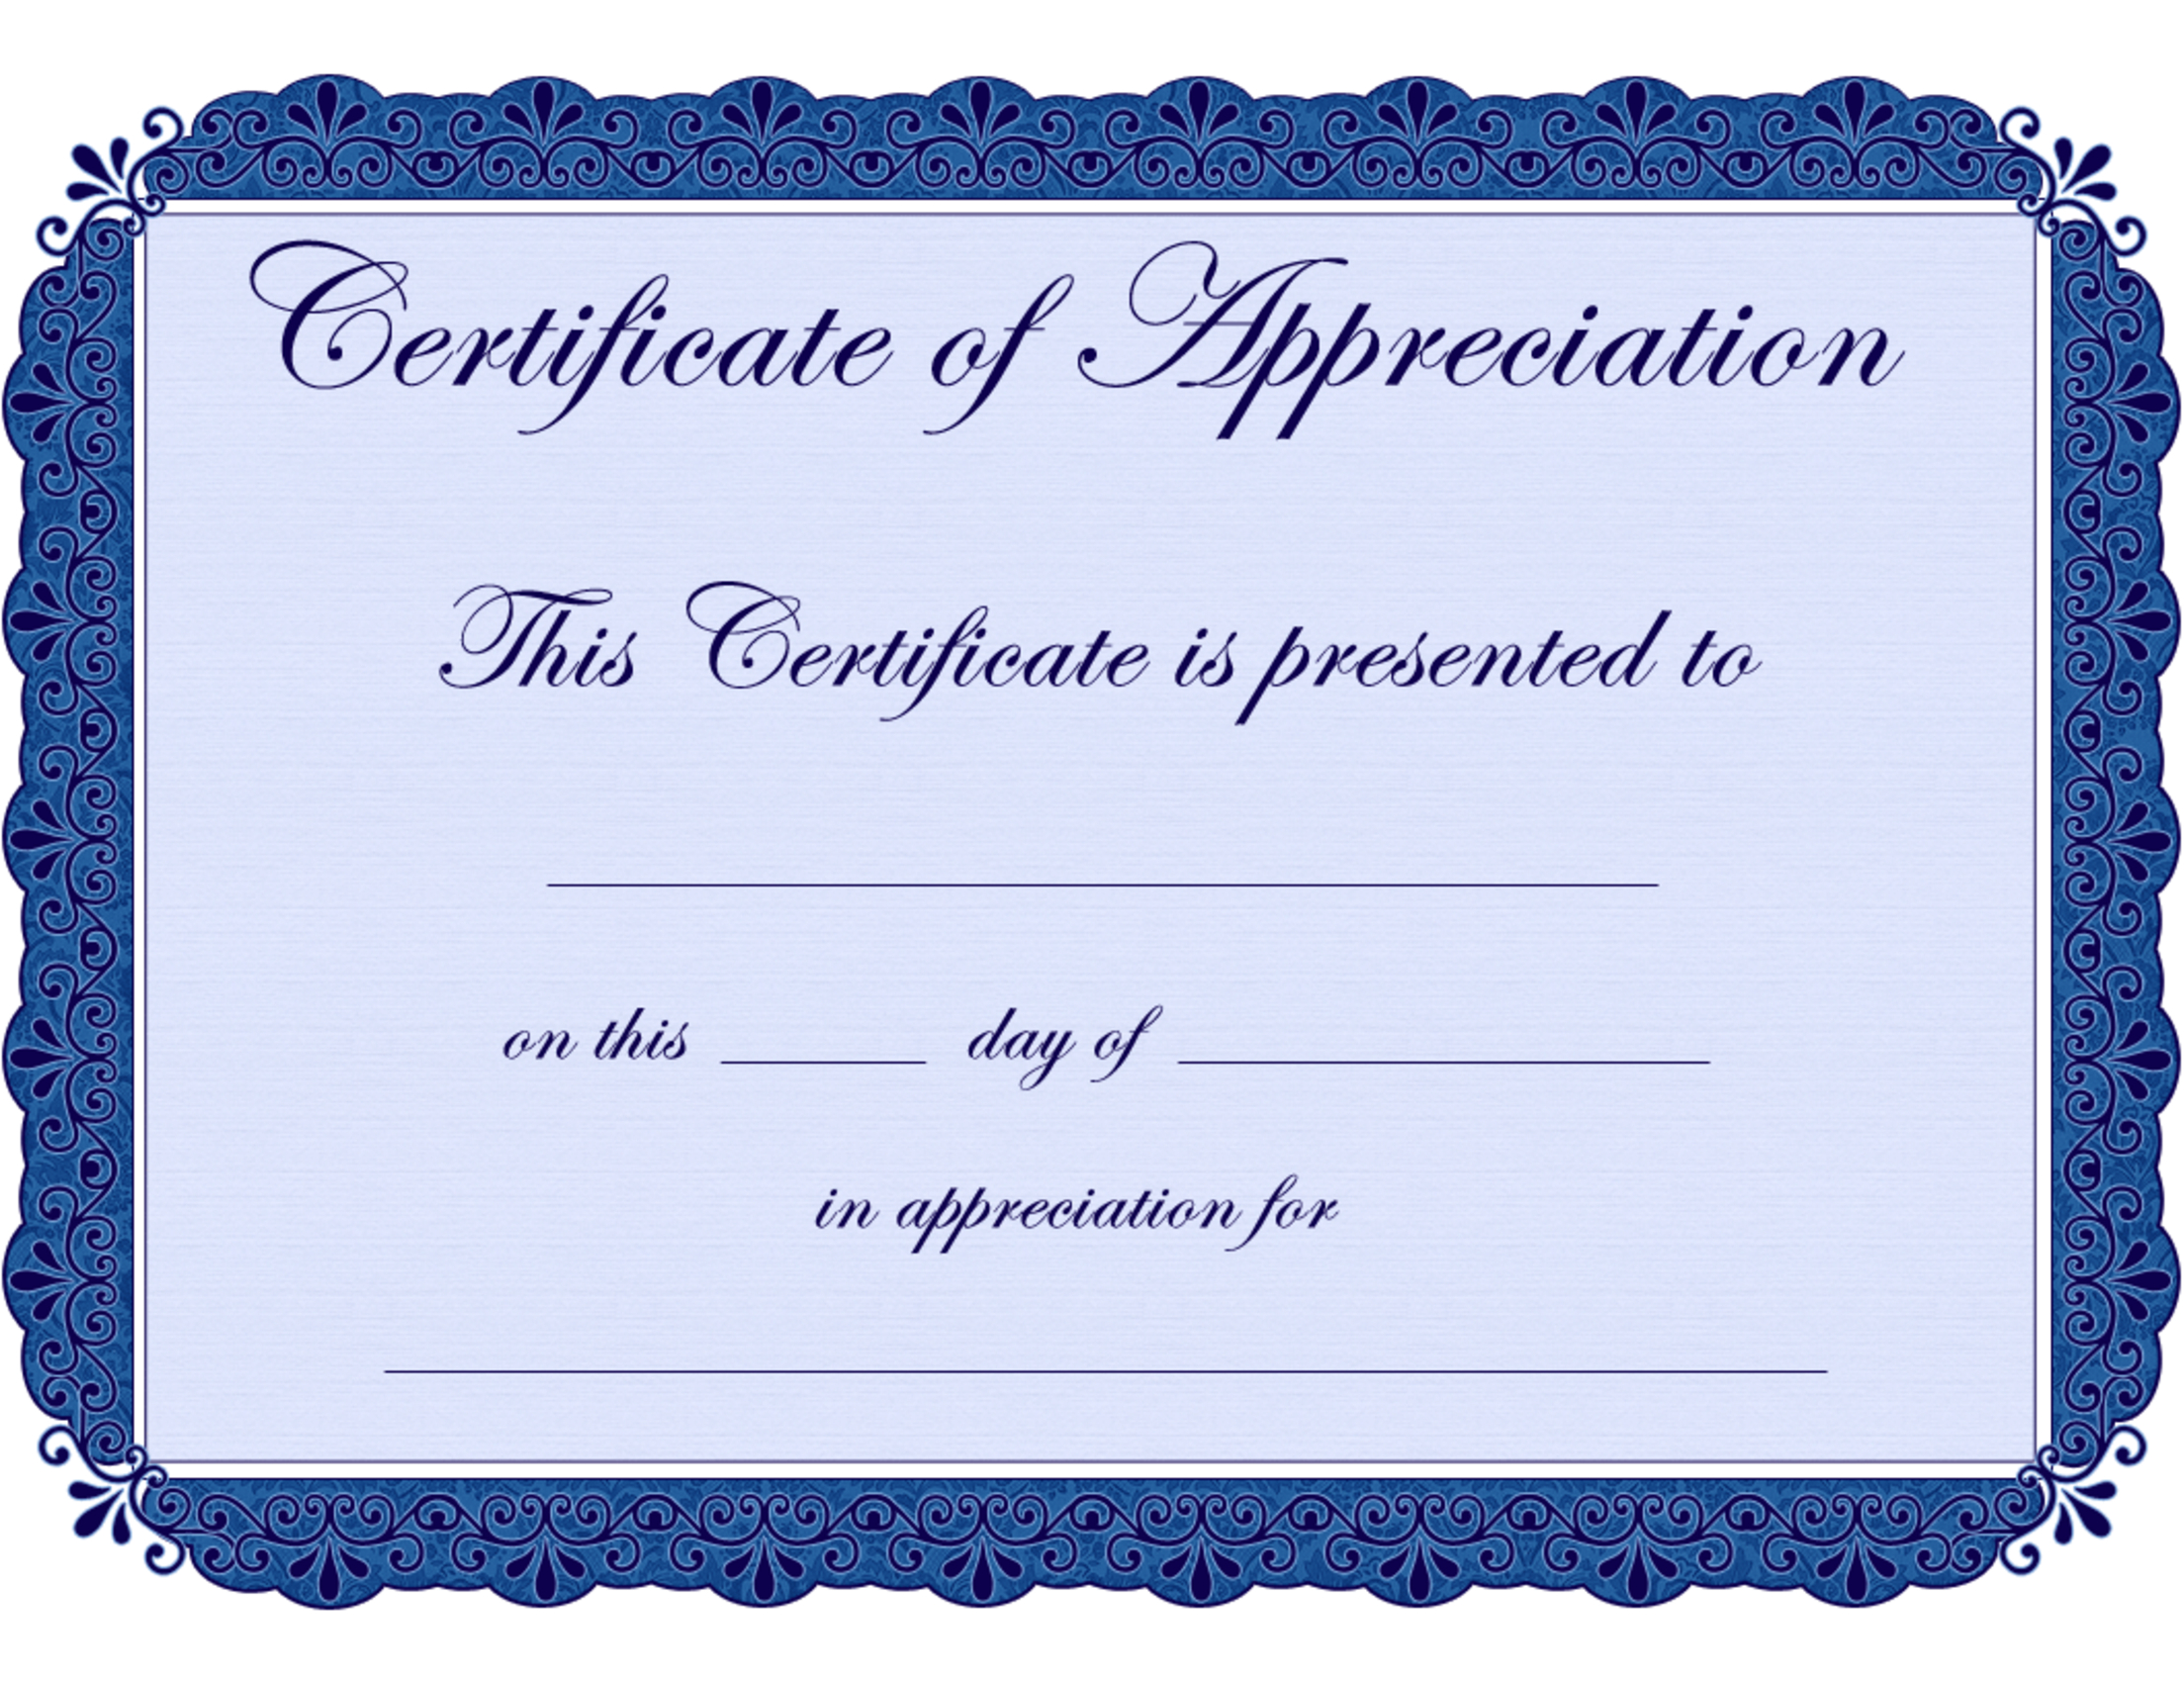 Free Printable Certificates Certificate Of Appreciation Regarding Graduation Gift Certificate Template Free